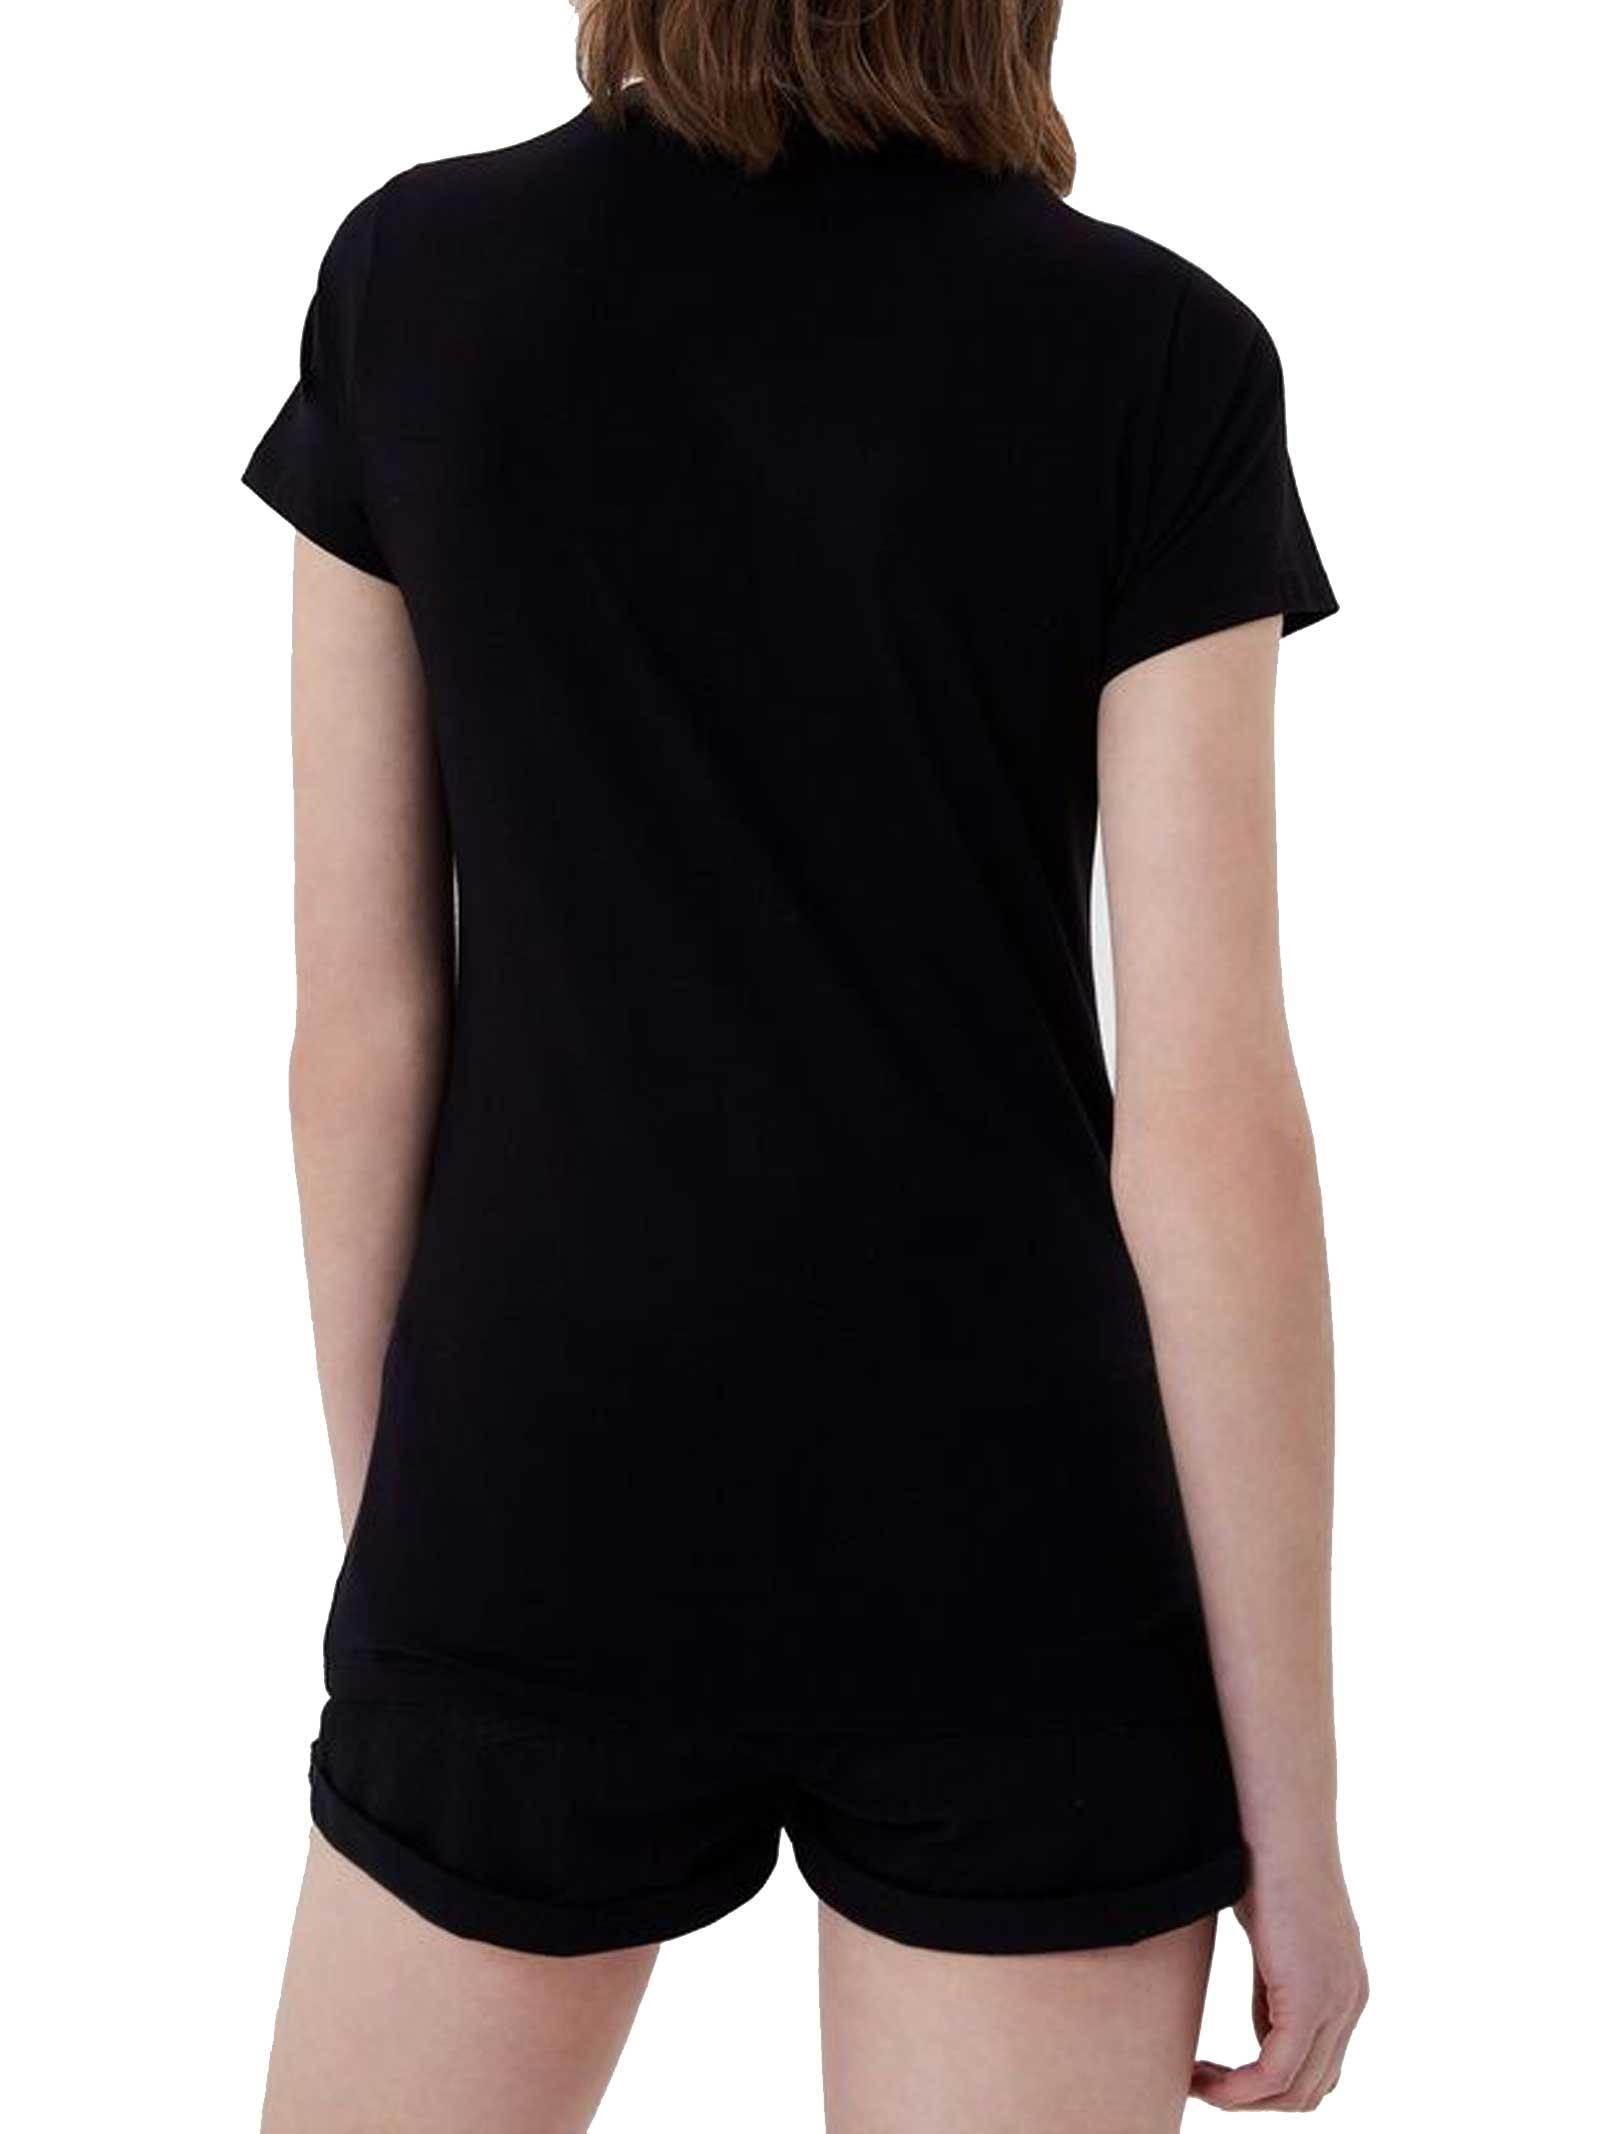 T-SHIRT LIU JO LIU JO | T-shirt | WA1569-J0250T9796